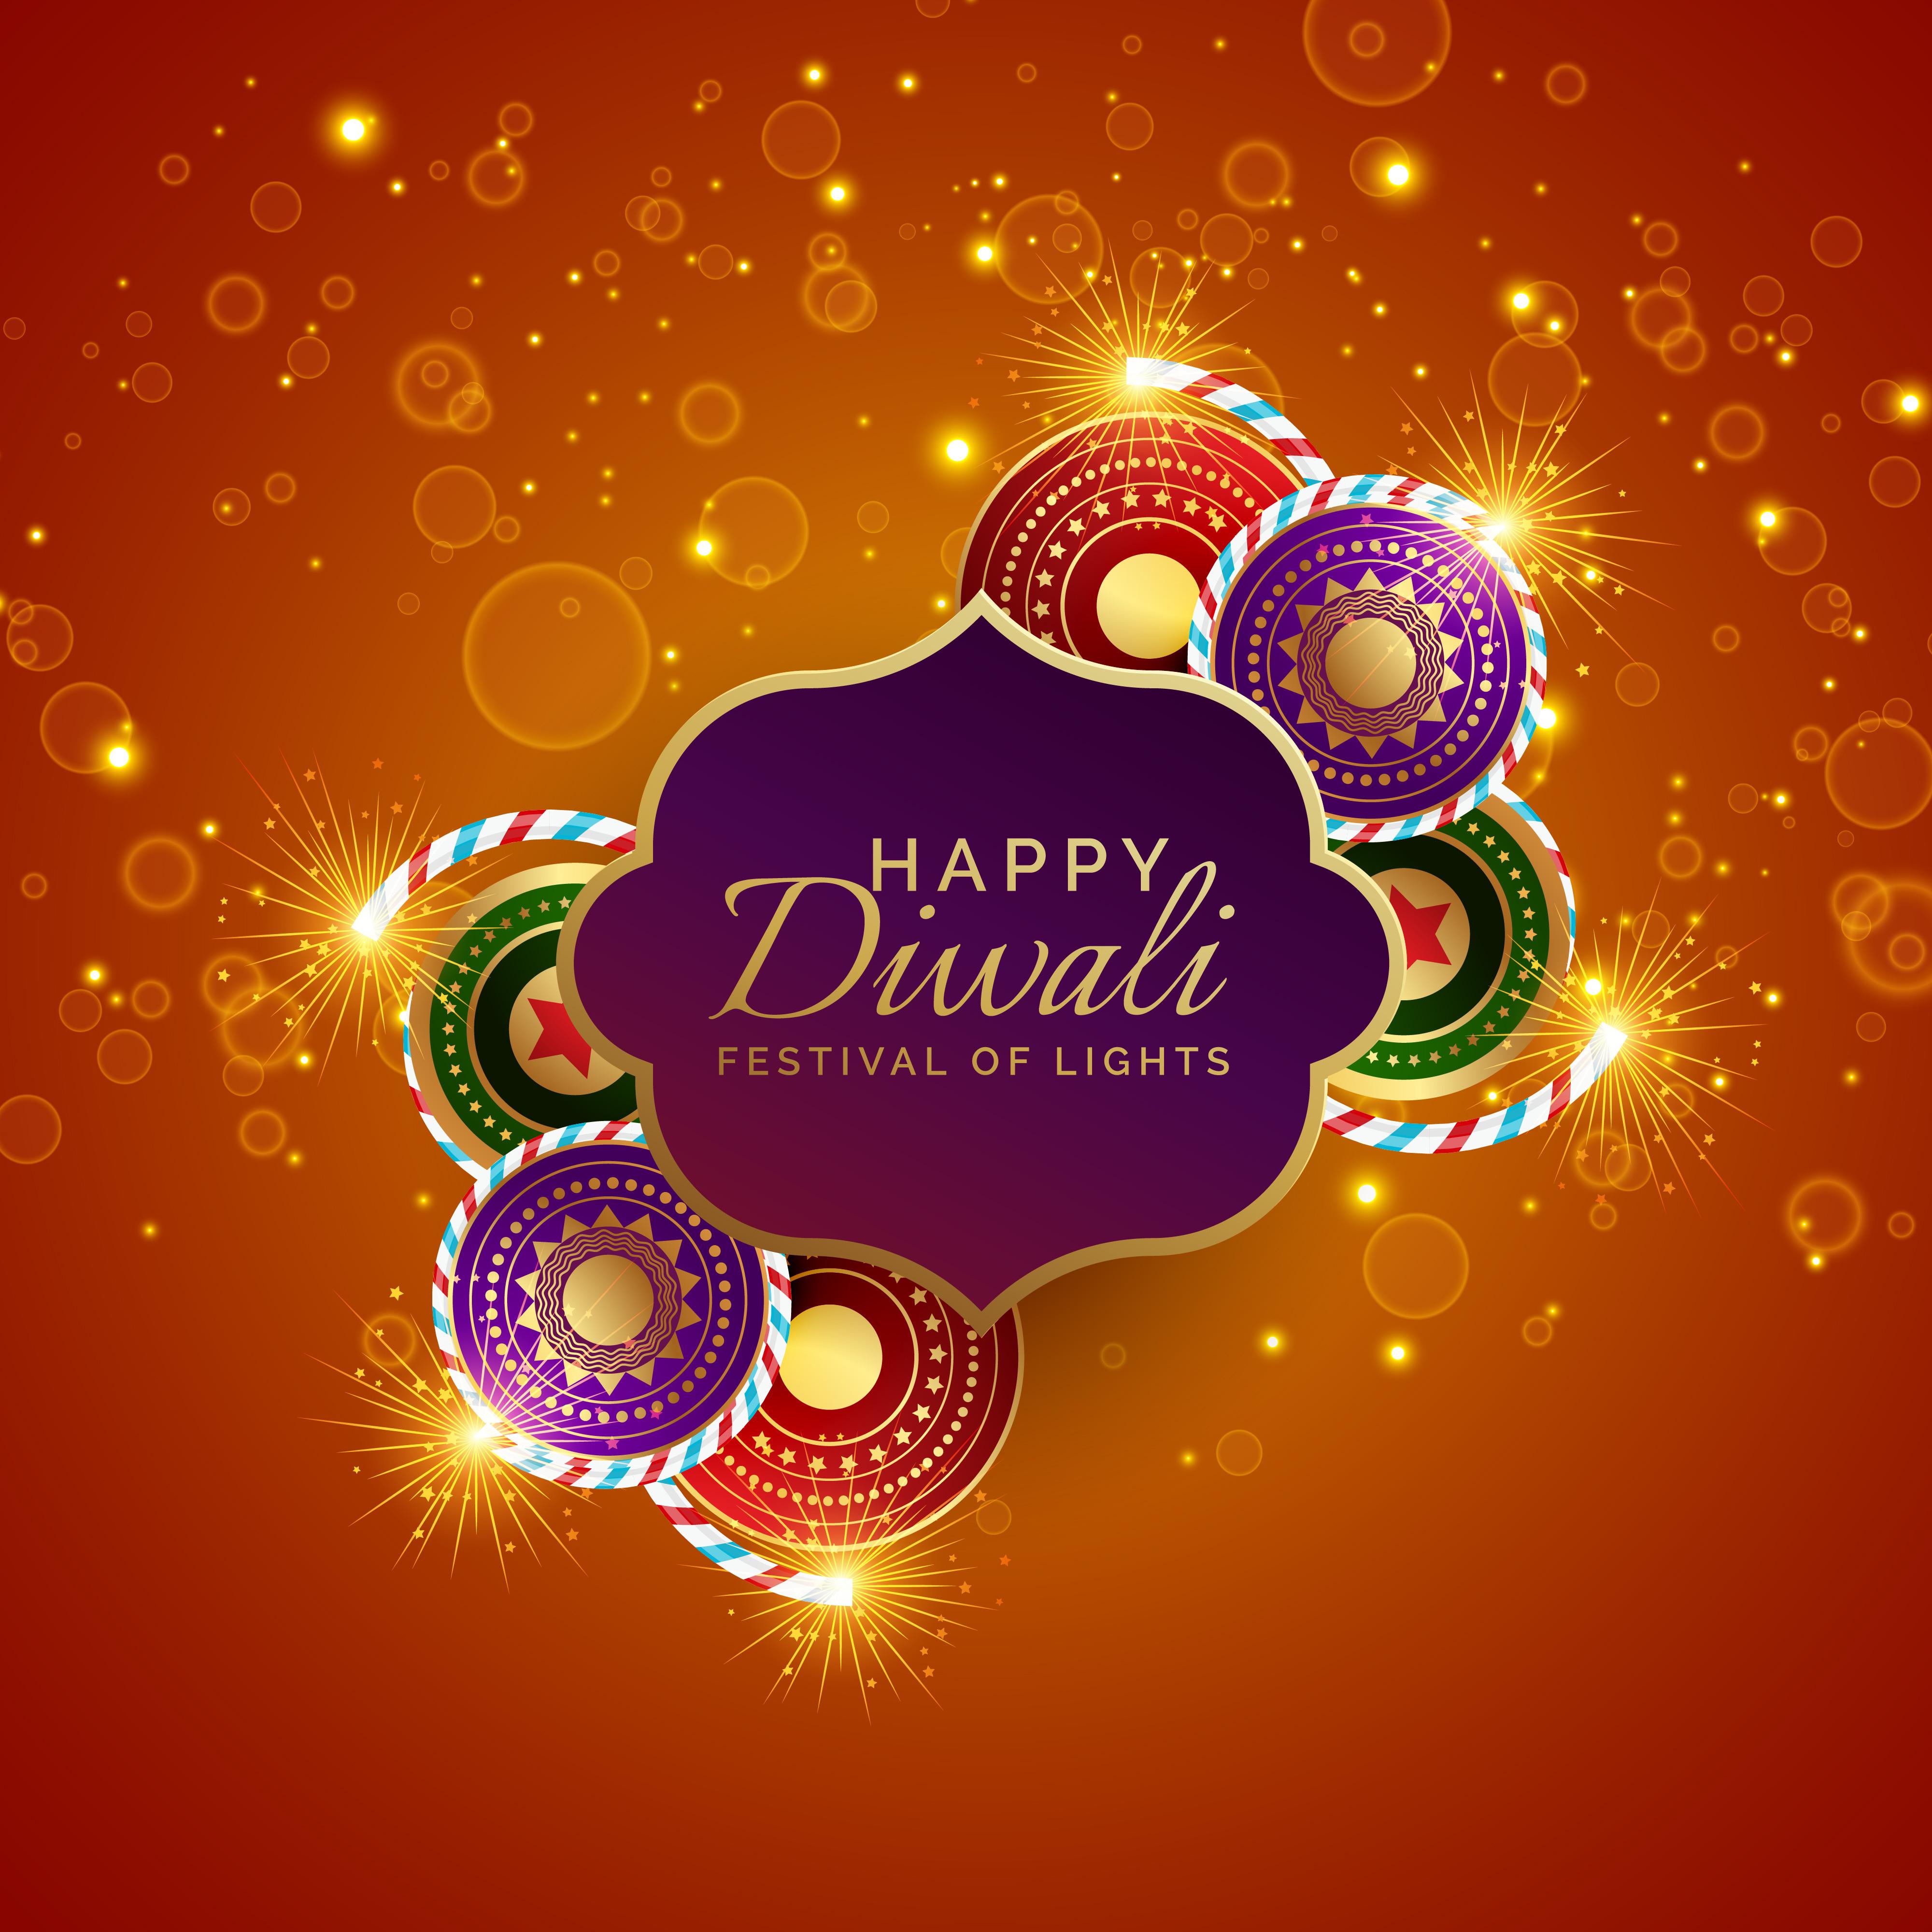 Diwali Free Vector Art 3130 Free Downloads